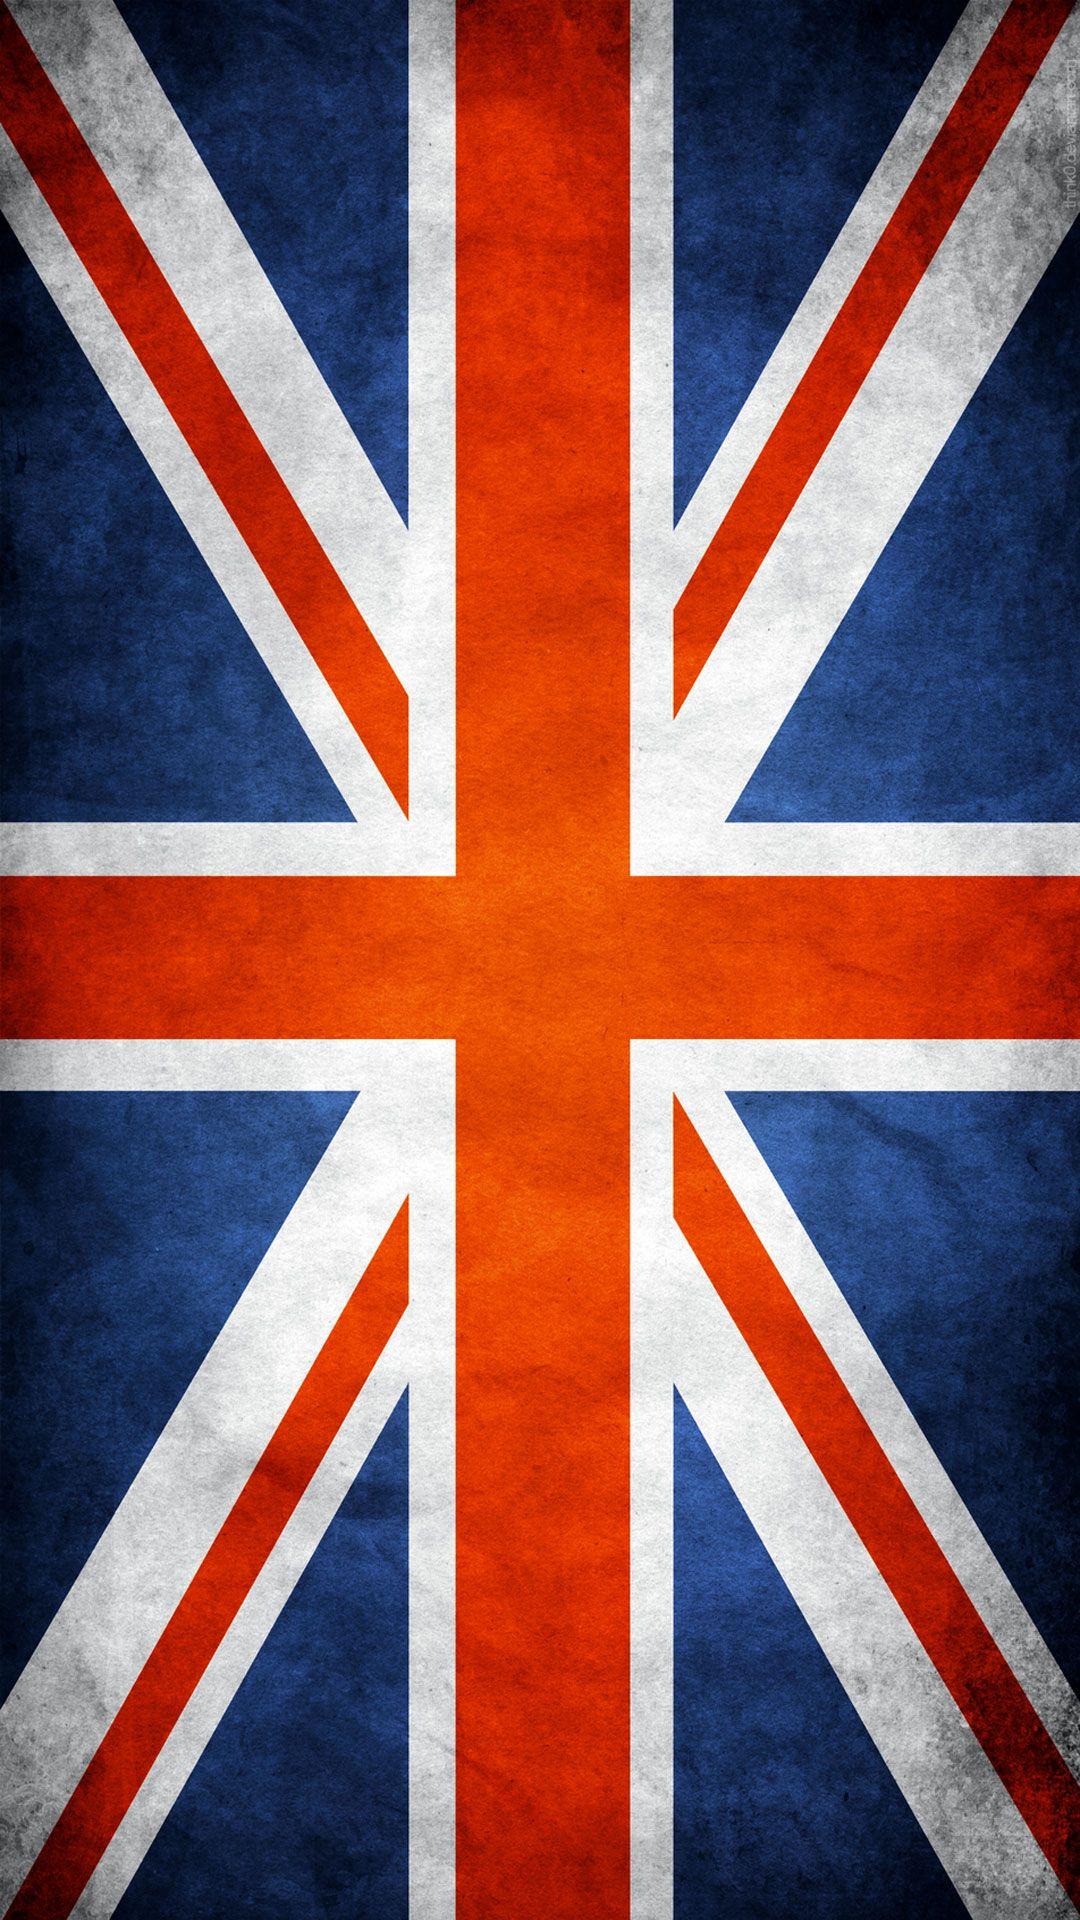 Union Jack Papeis De Parede Para Iphone Inglaterra Bandeira Wallpaper Wallpaper